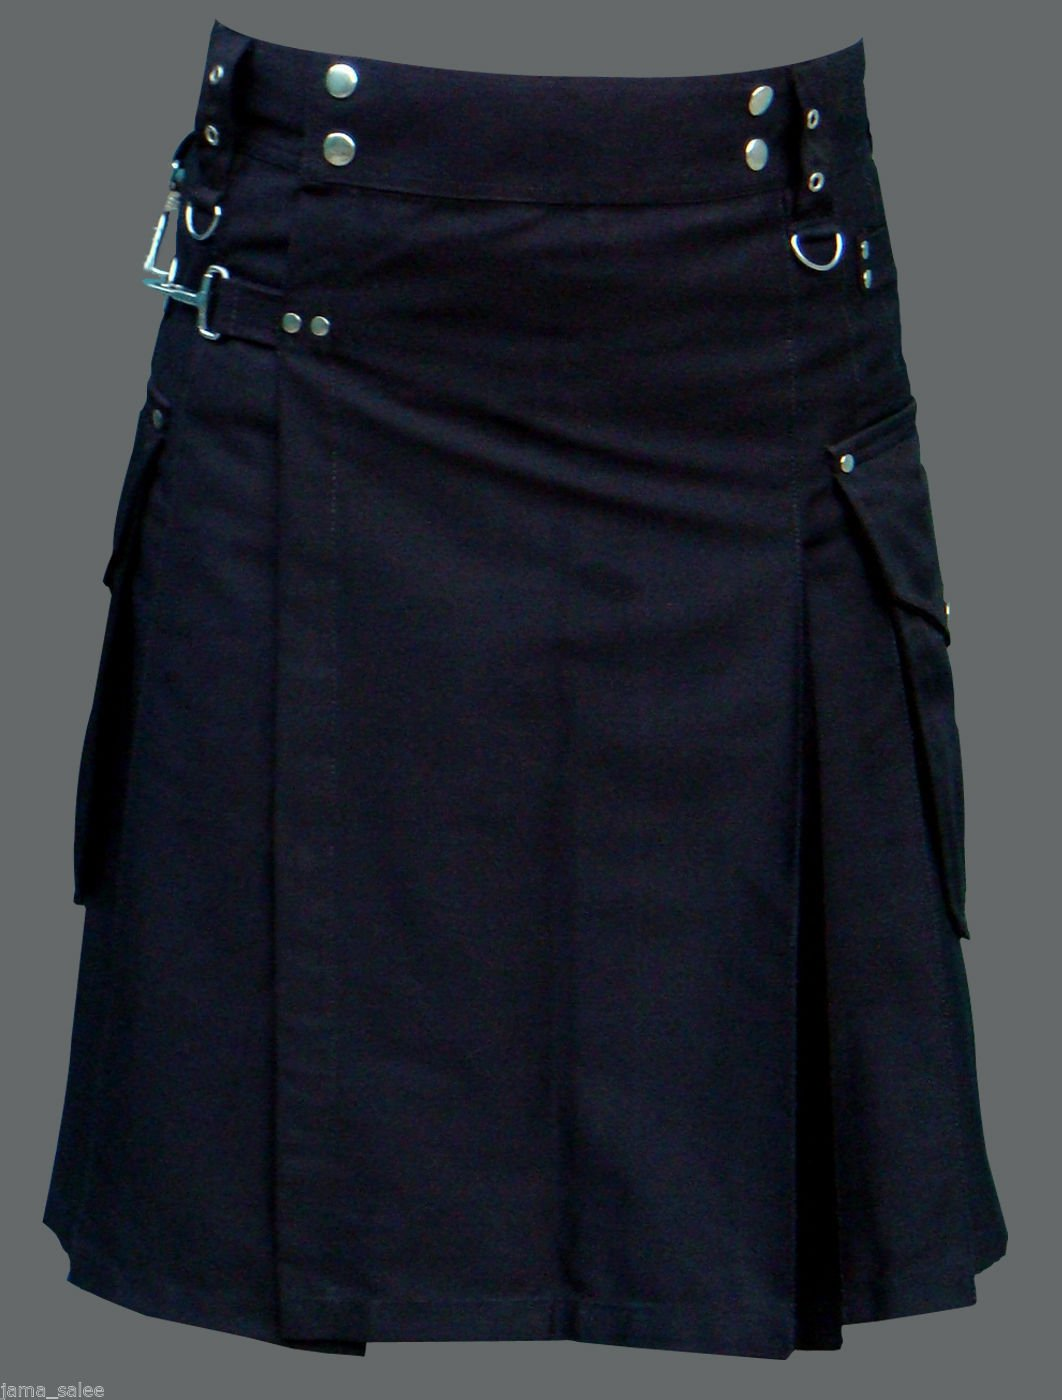 Men 40 Waist Handmade Black Deluxe Utility Kilt 100% Cotton With Cargo Pockets